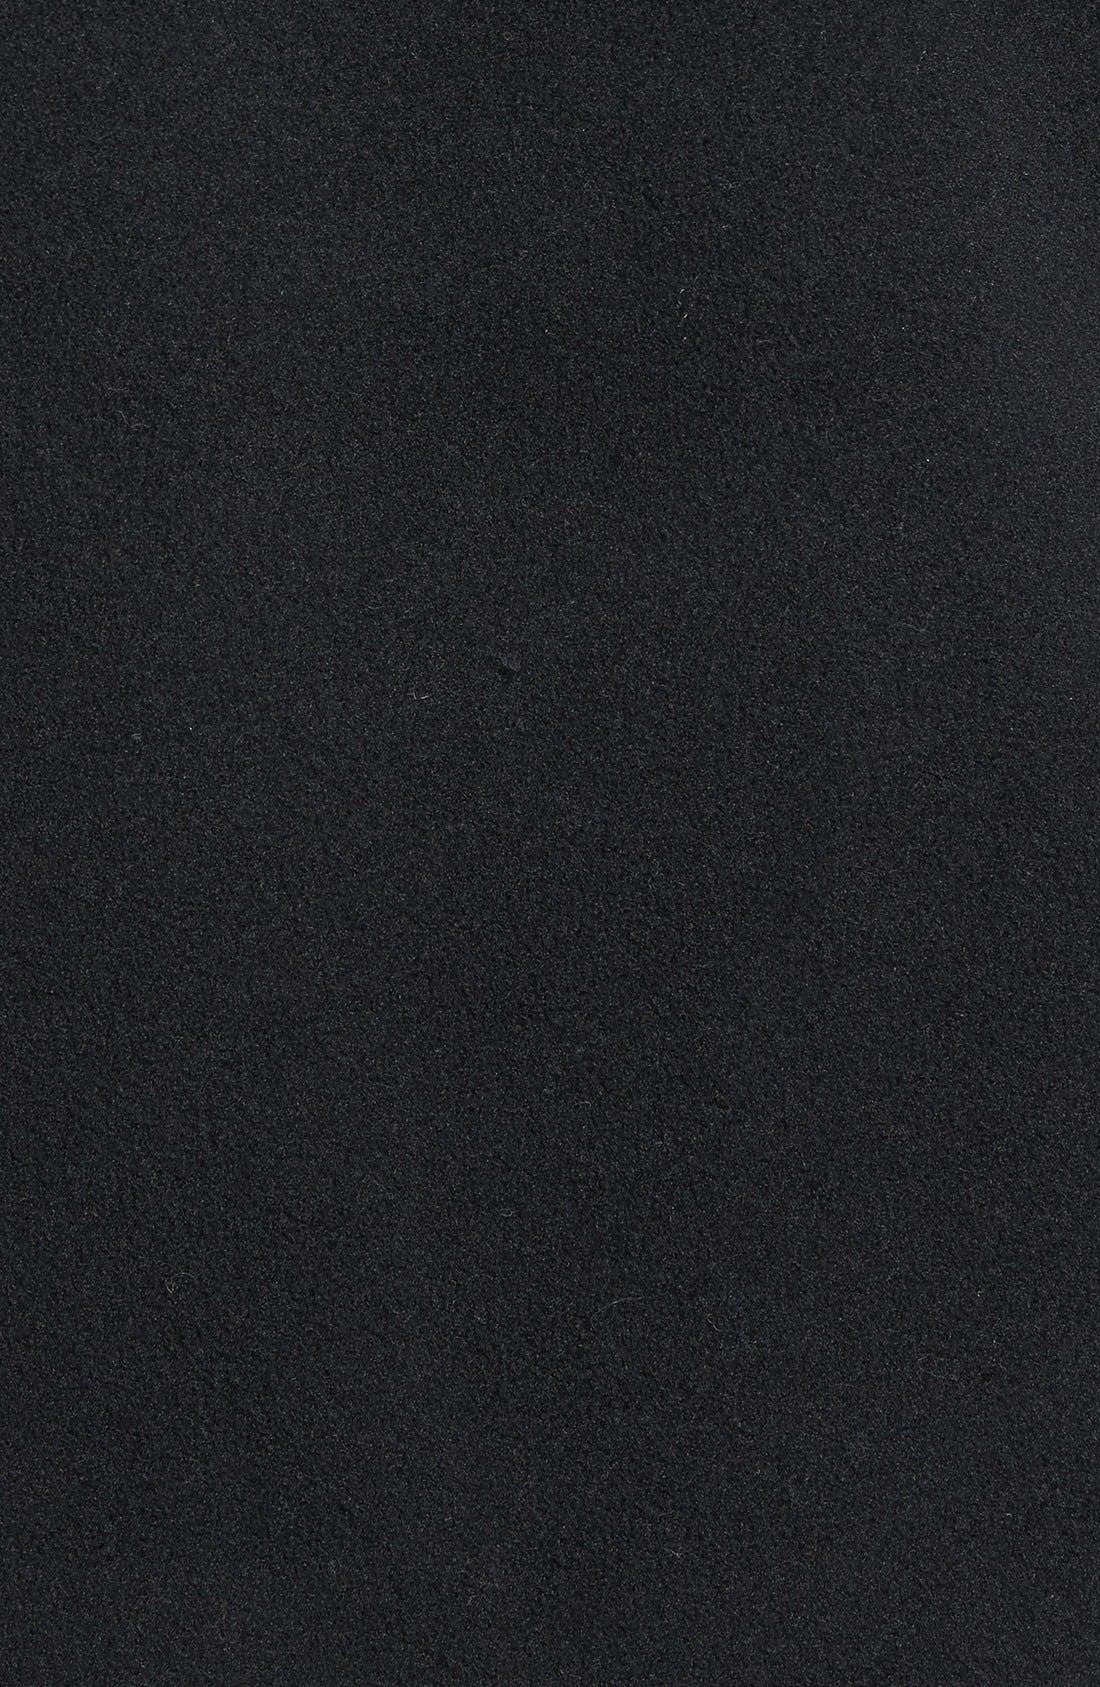 Denali 2 Recycled Fleece Jacket,                             Alternate thumbnail 7, color,                             001